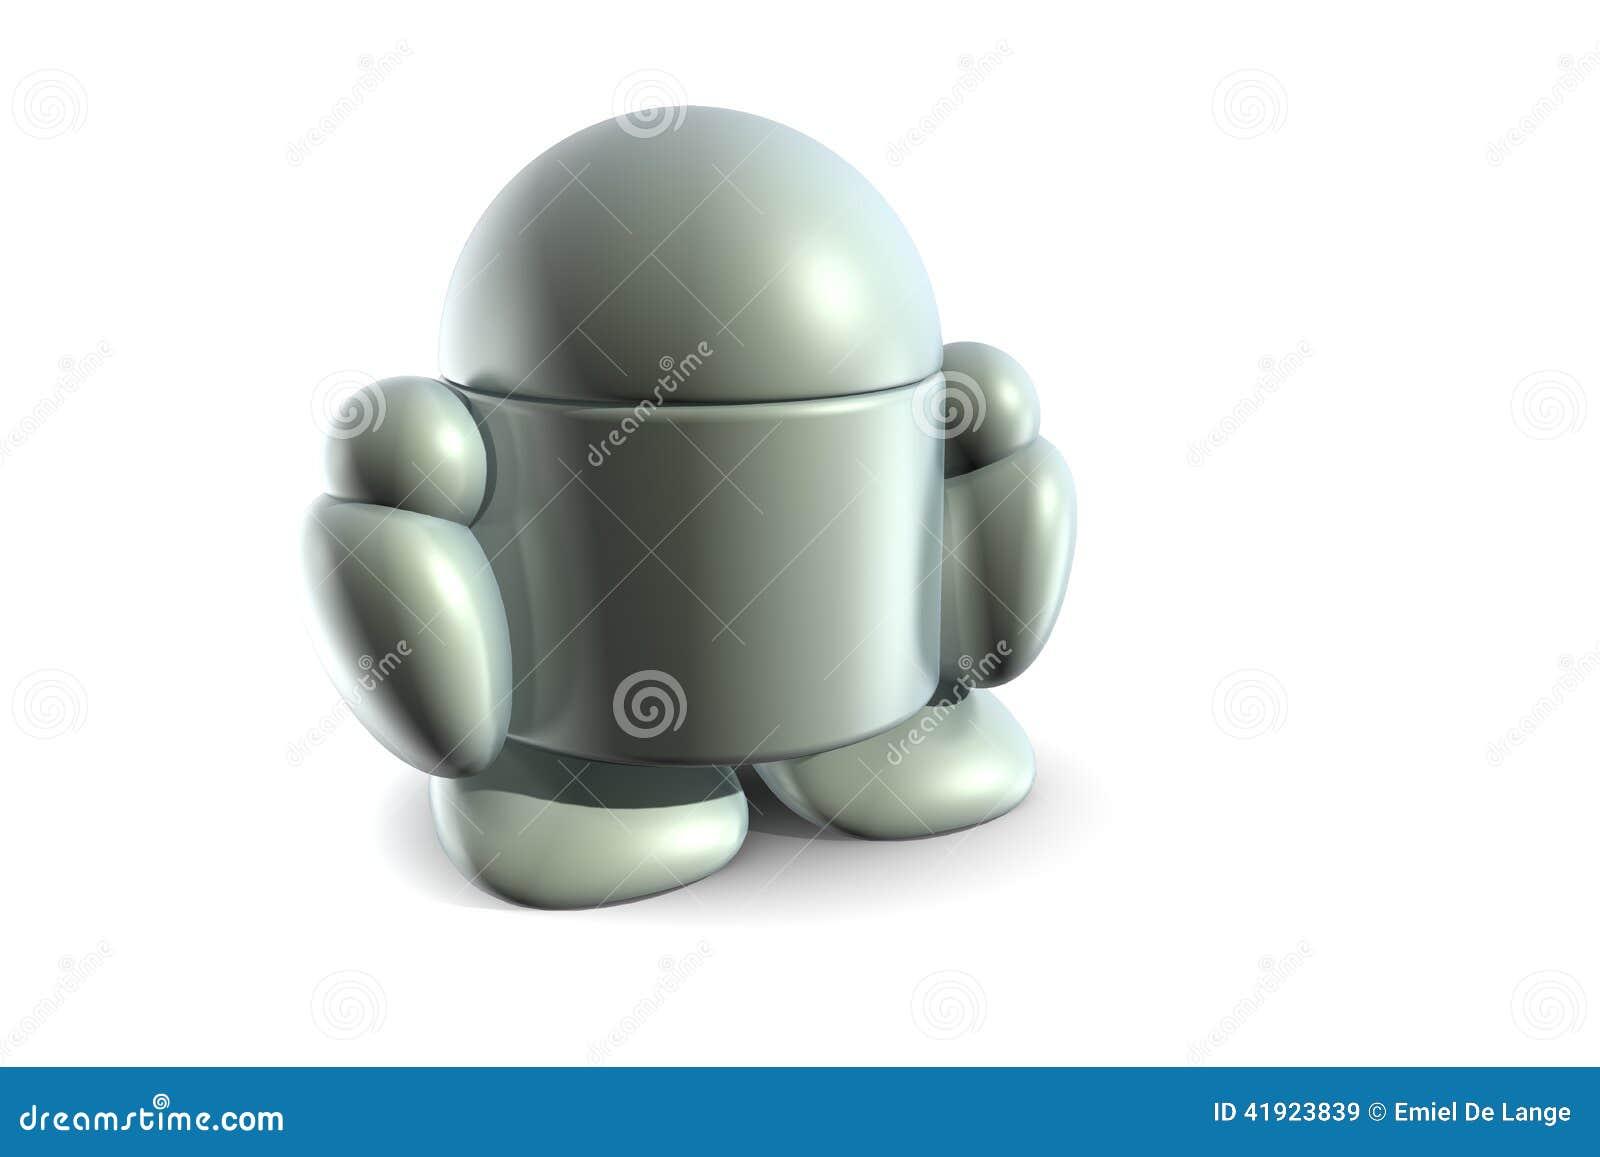 Fußboden Roboter ~ Einsamer roboter stockbild bild von kugeln fußboden